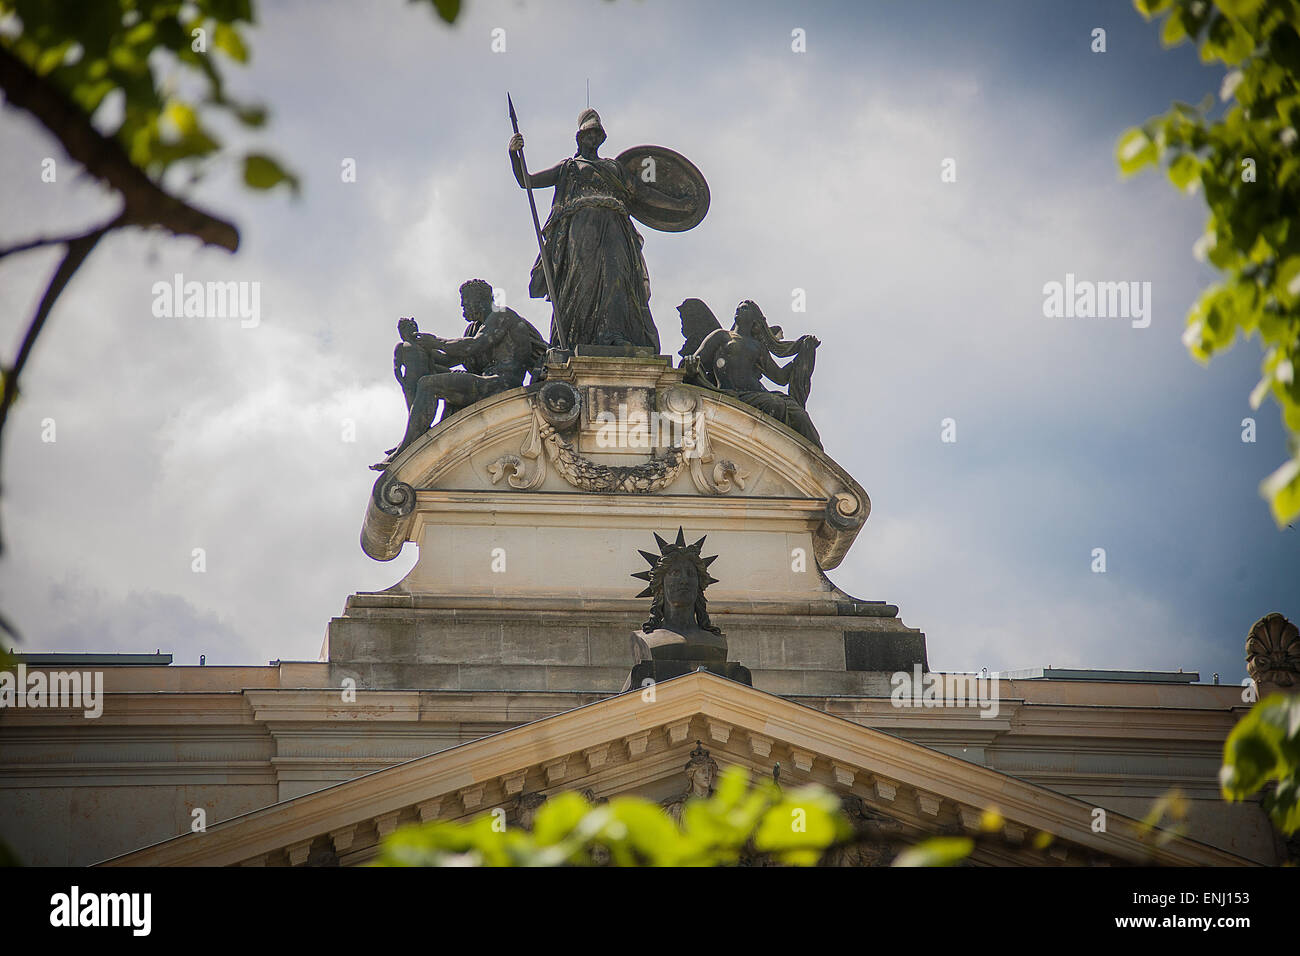 old baroque Dresden - vintage statue - Stock Image